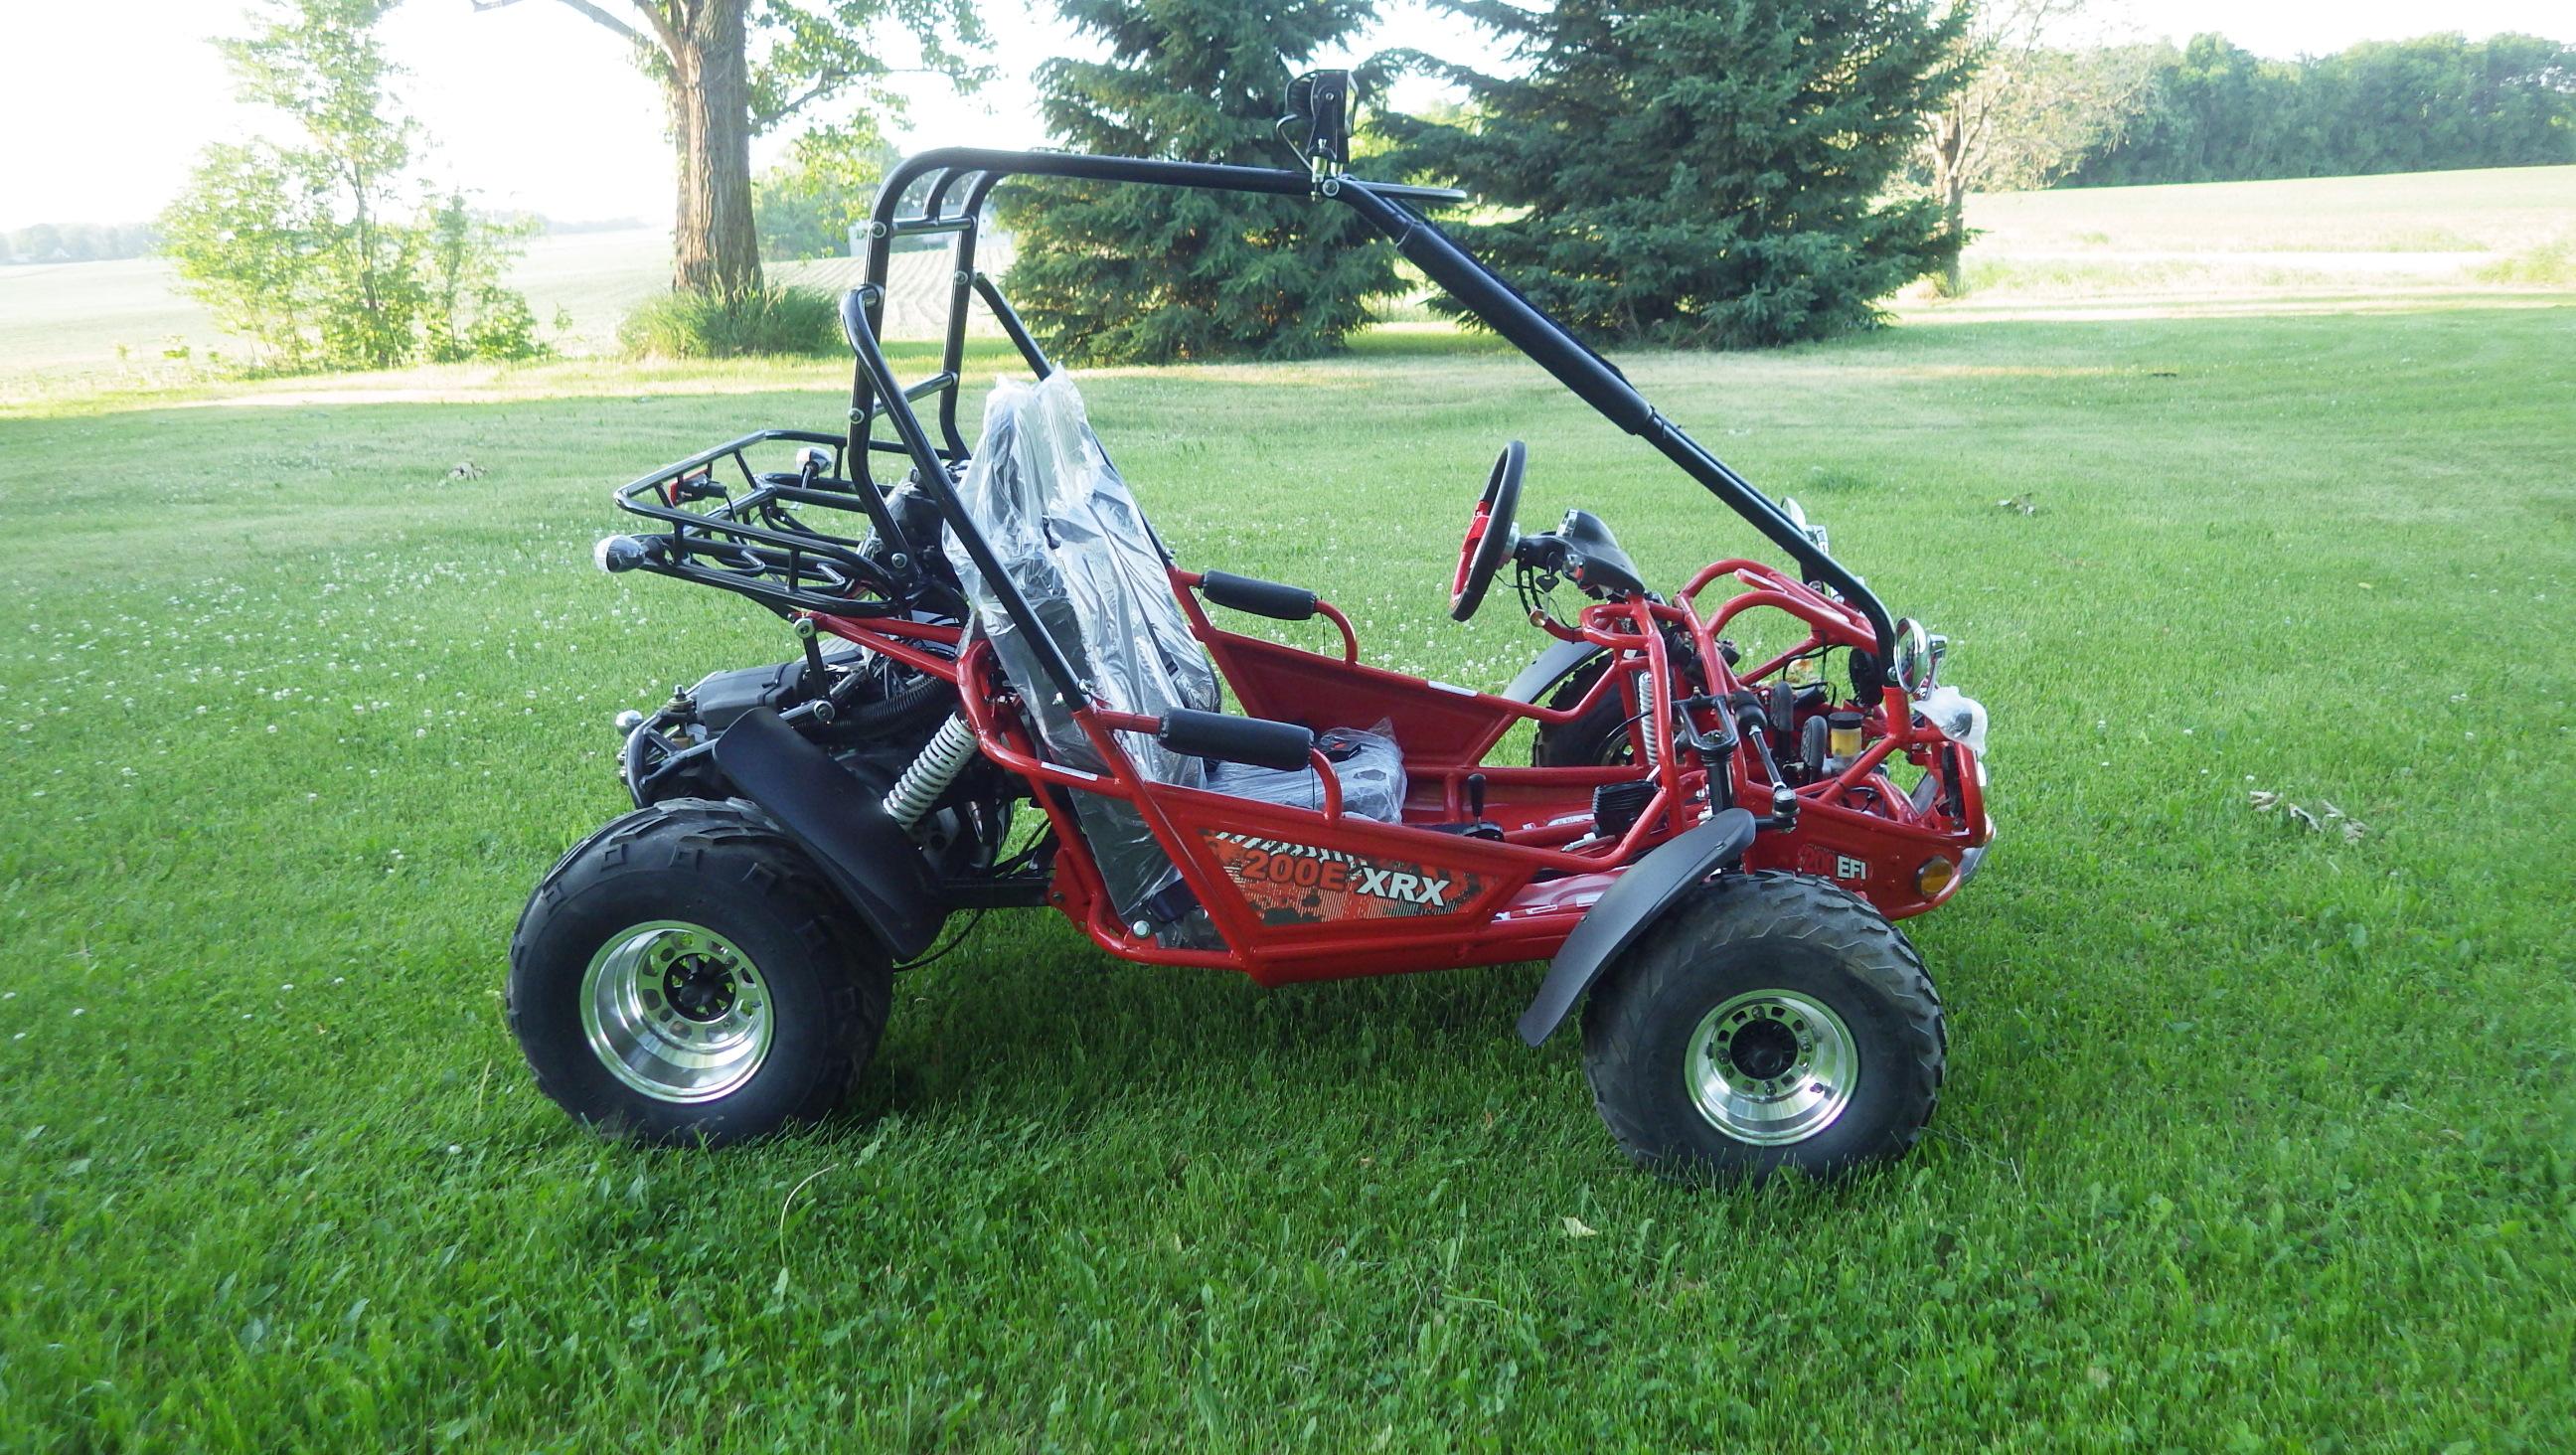 TrailMaster 200 E-XRX Red7